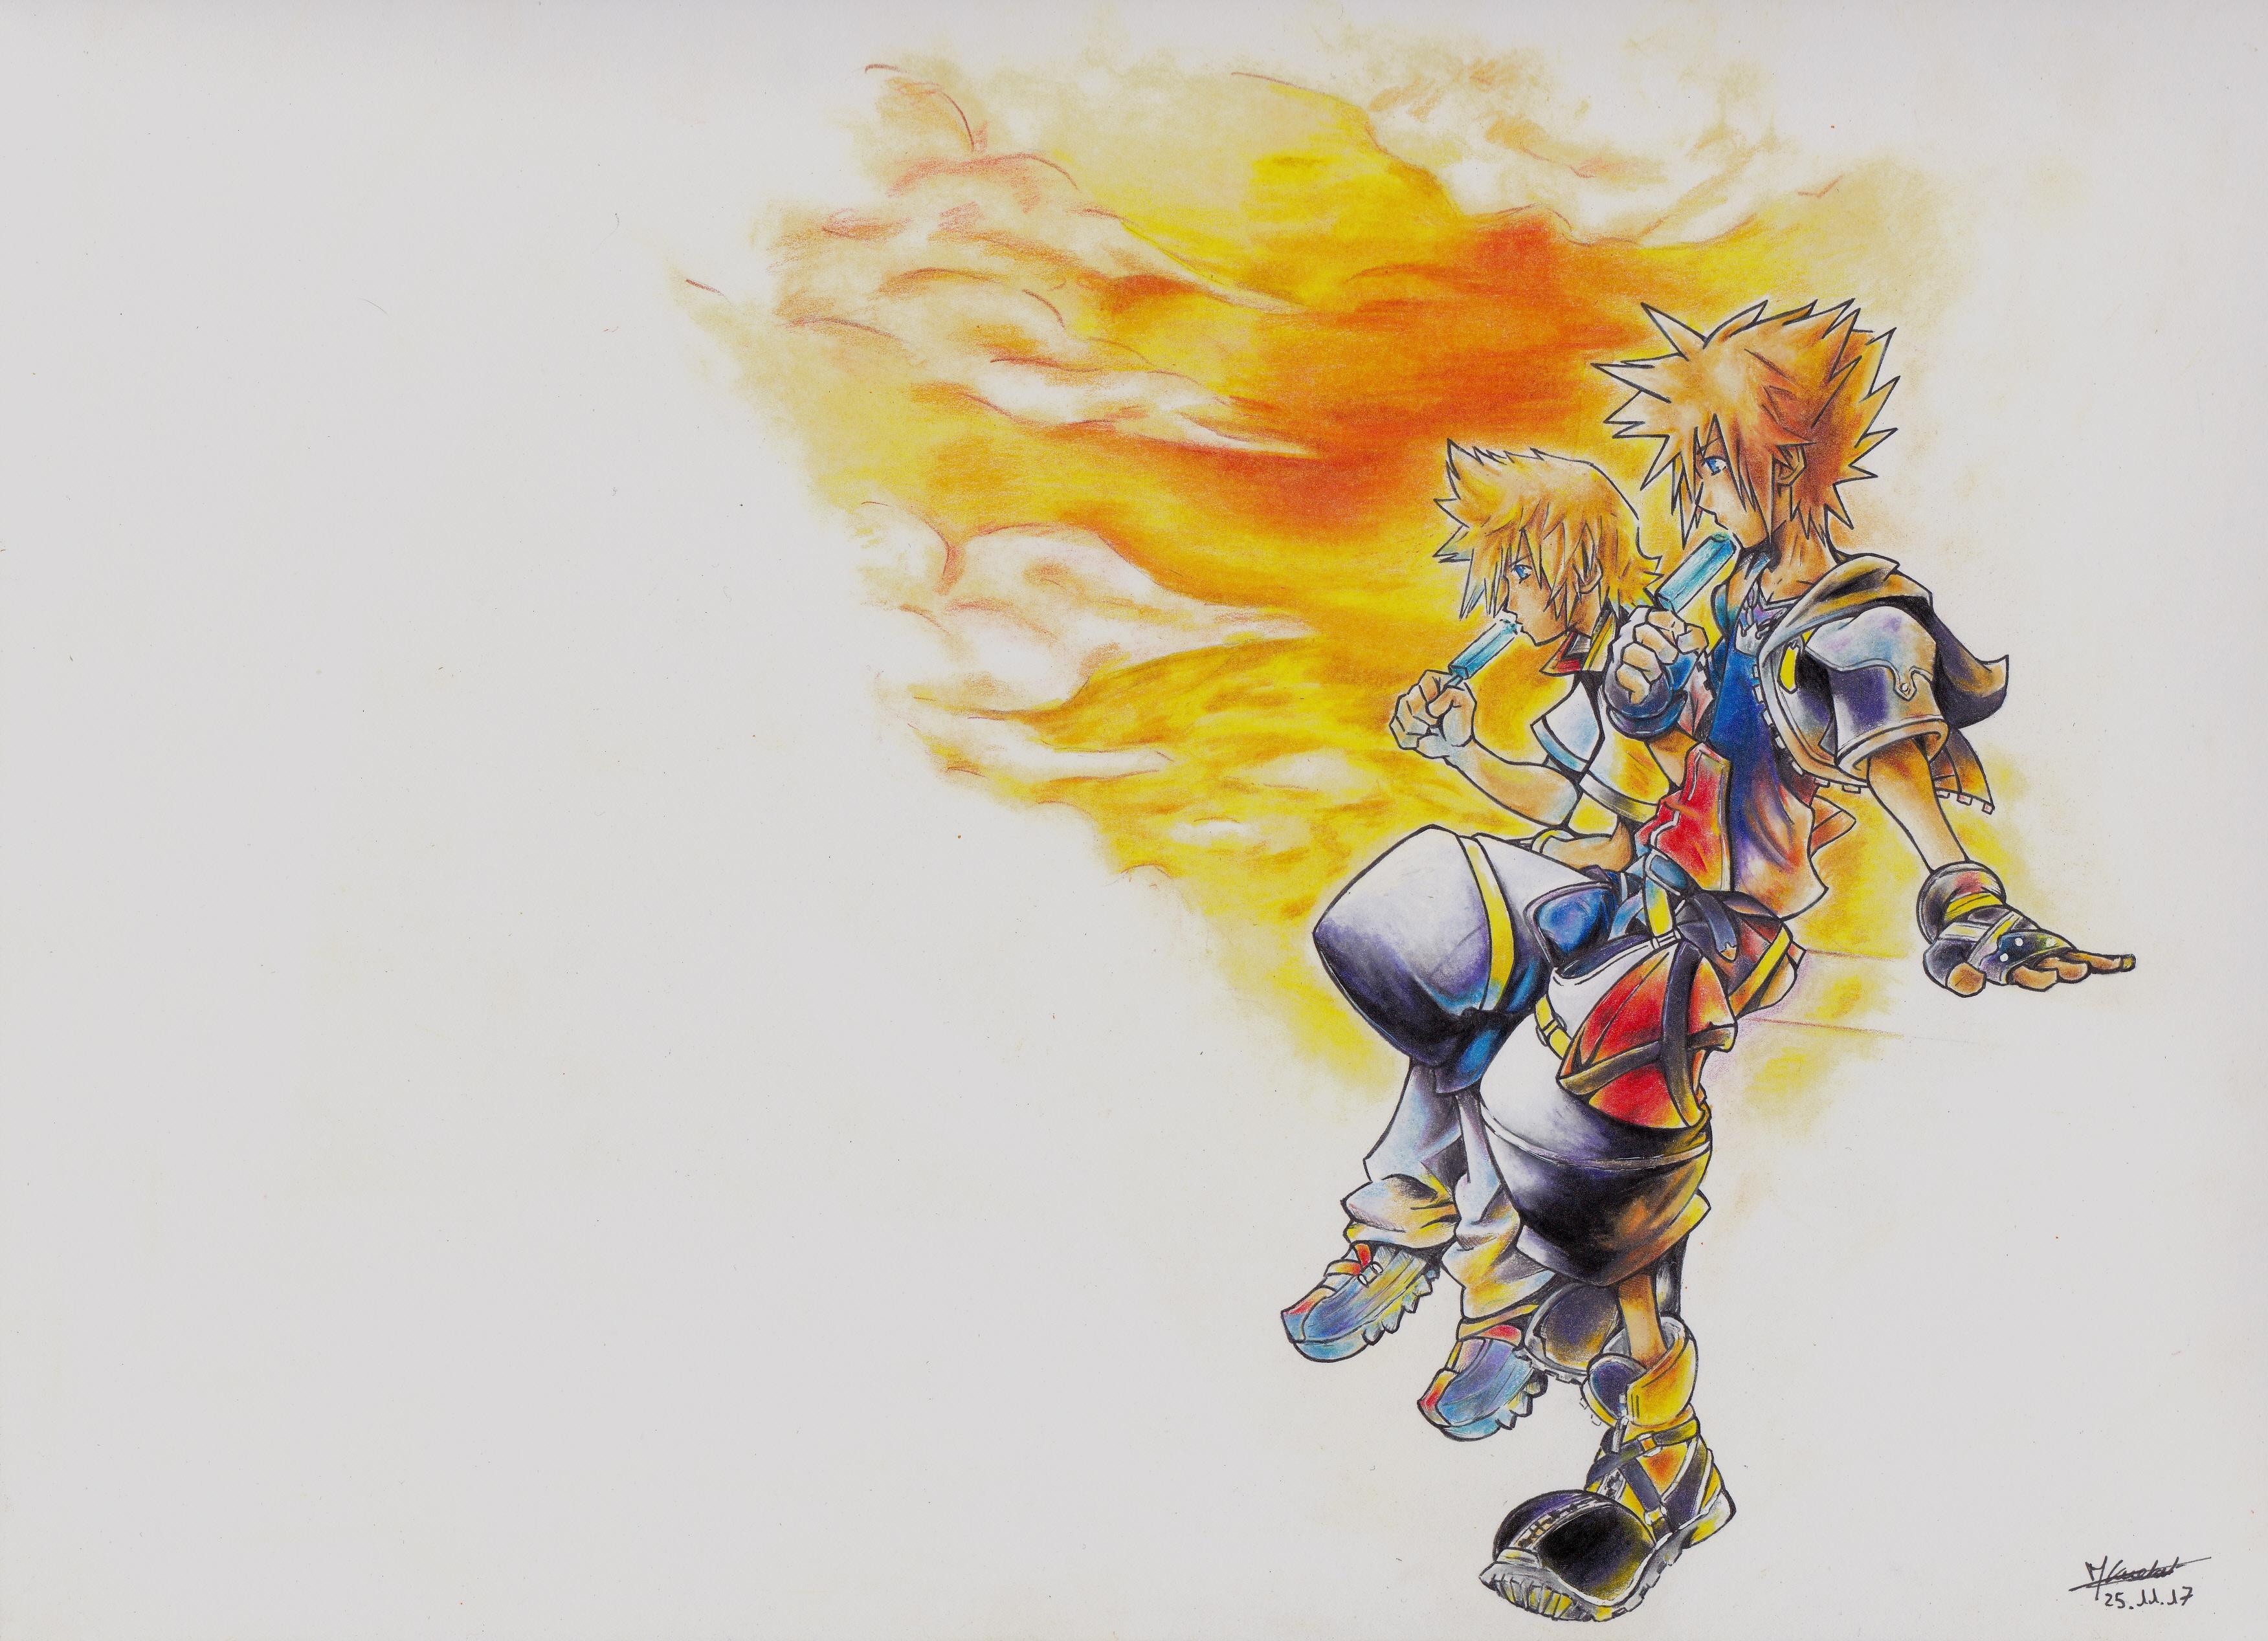 Dessin Kingdom Hearts de Bubulle23